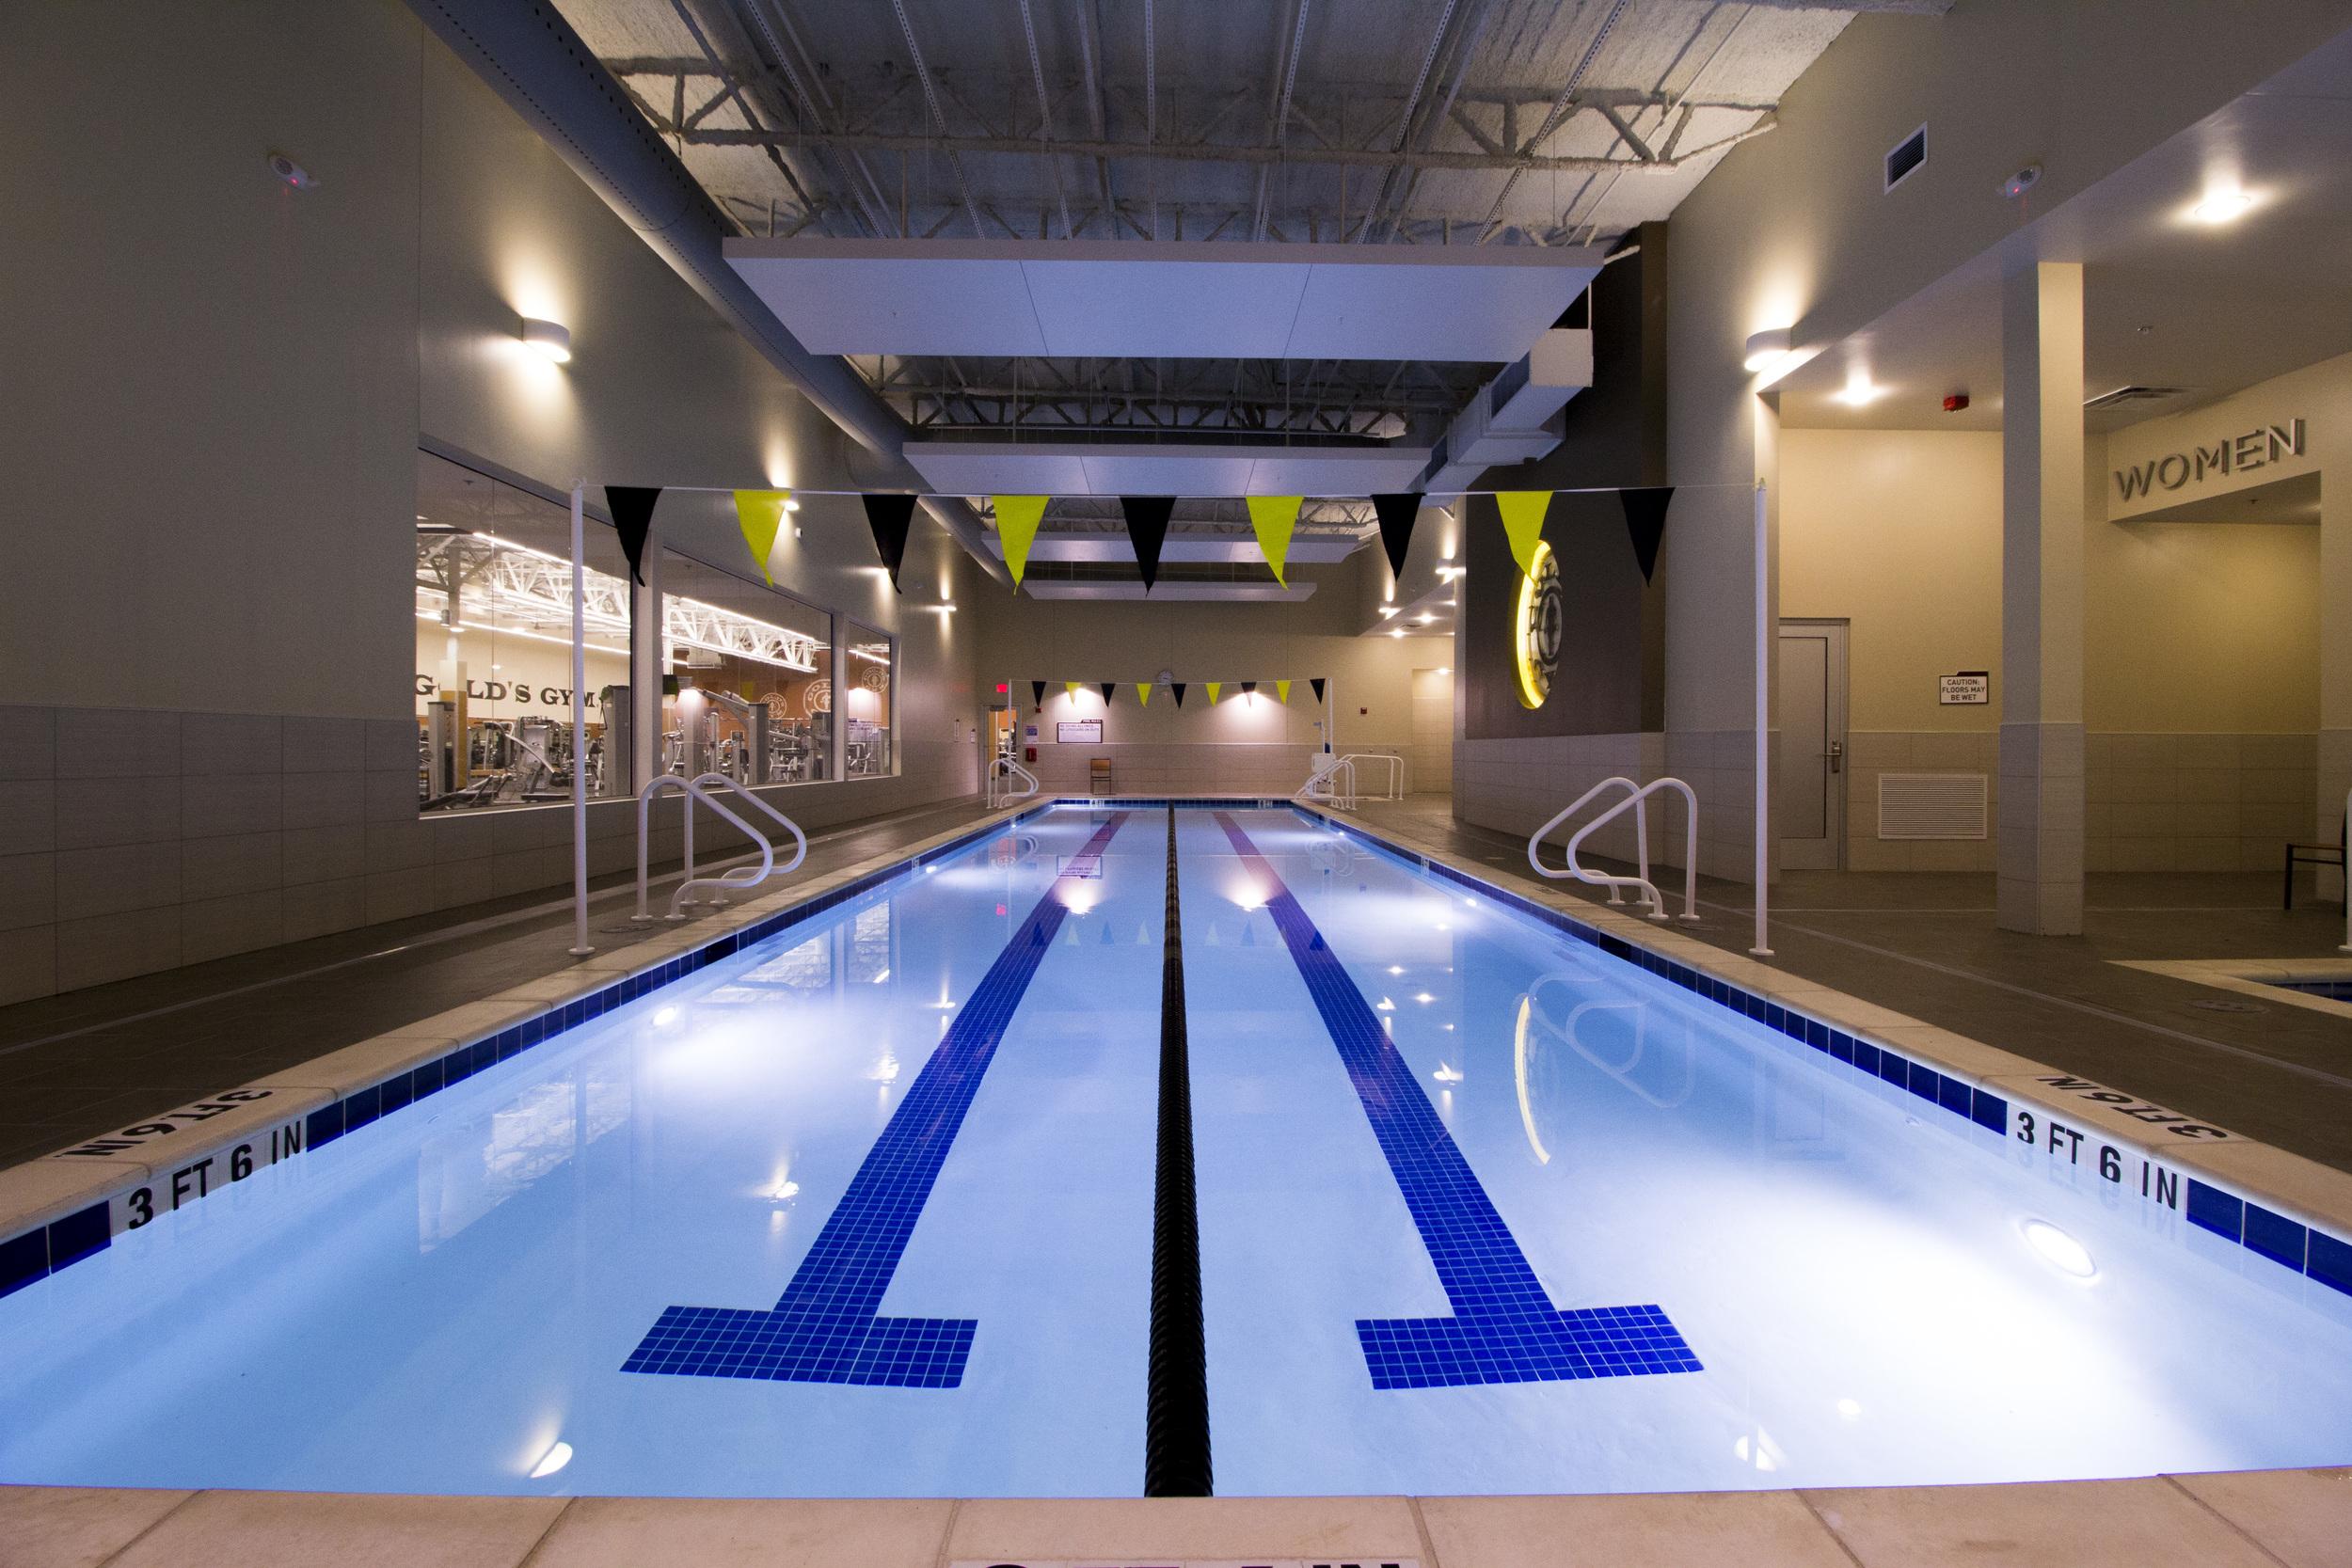 Golds Gym, New Braunfels, Texas